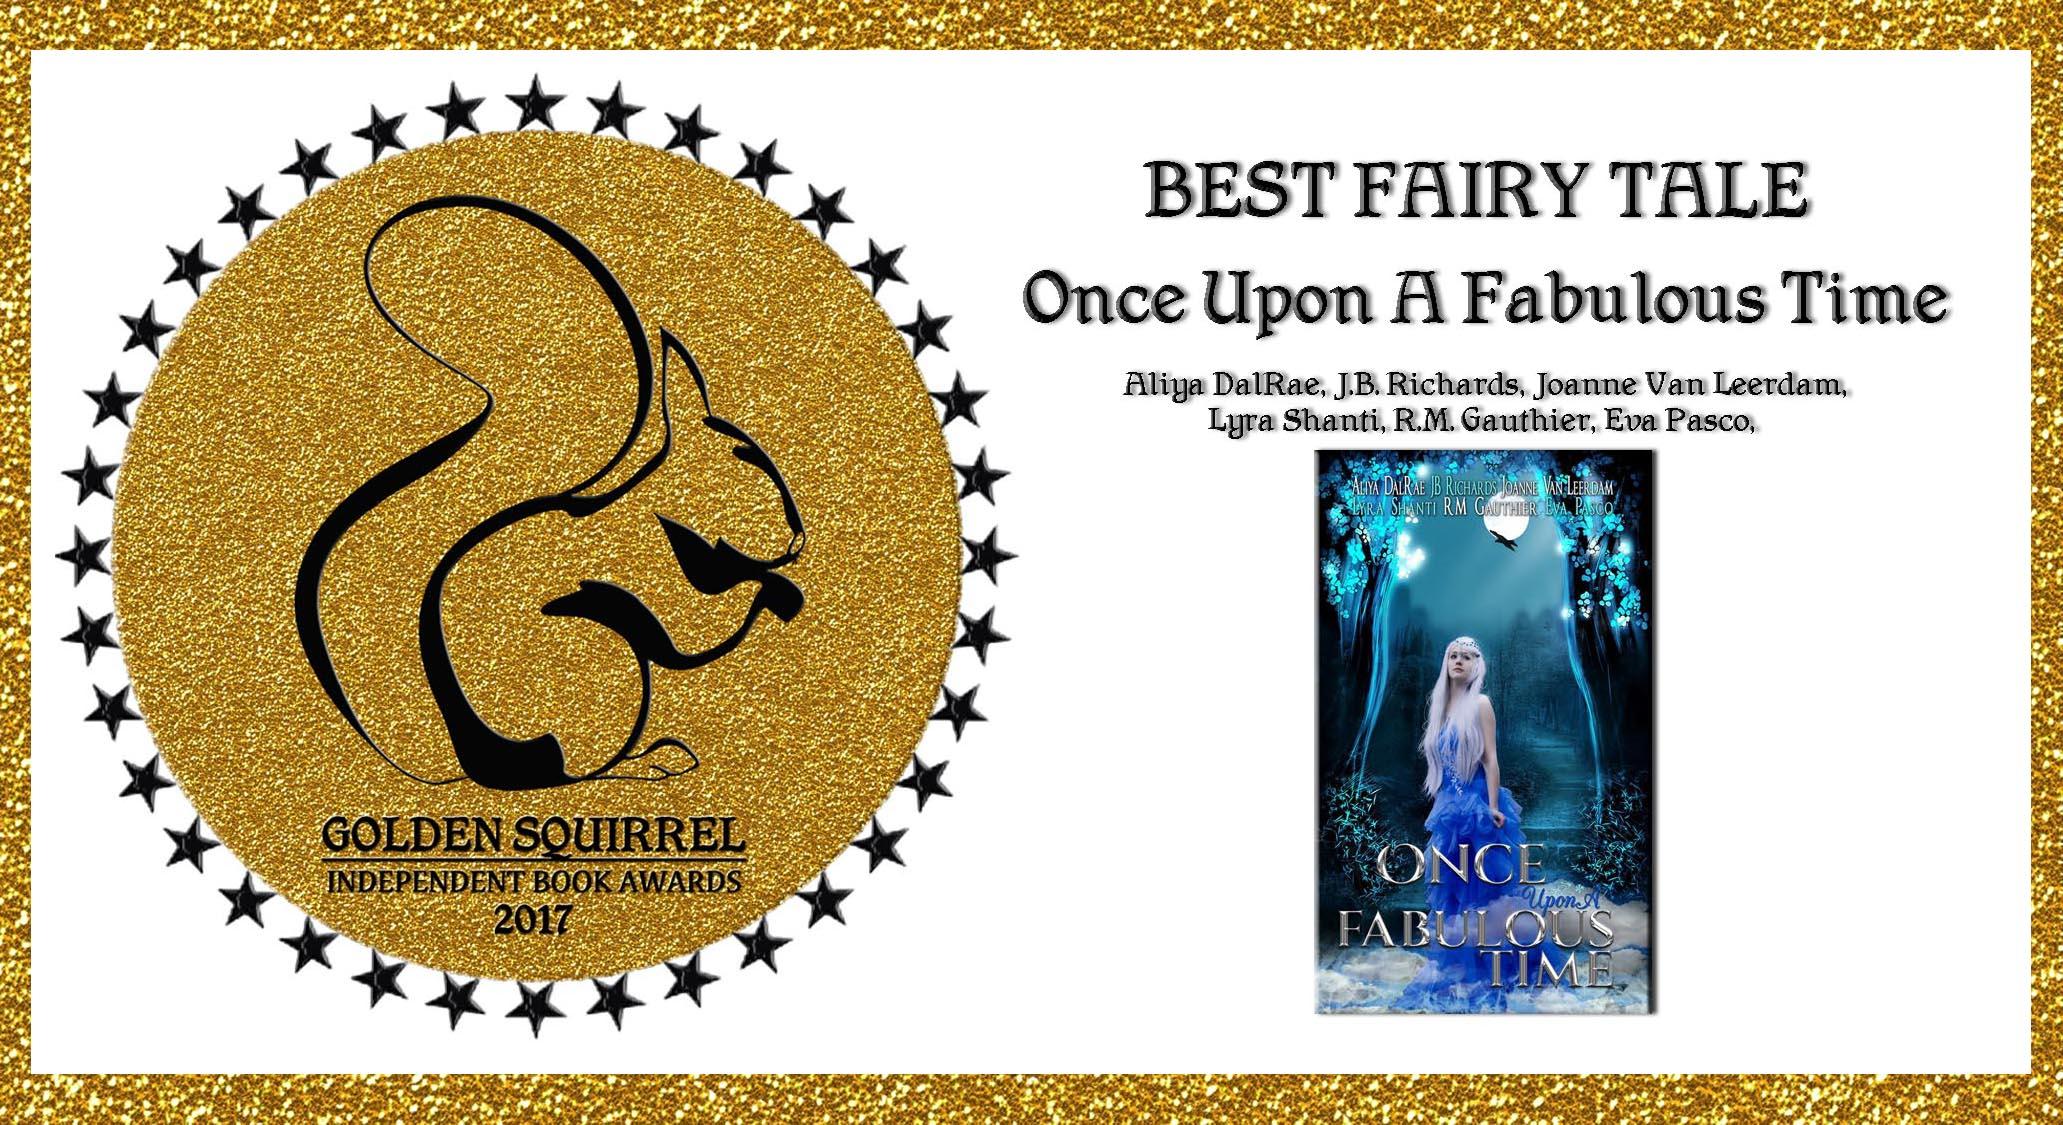 Golden Squirrel Best Fairy Tale